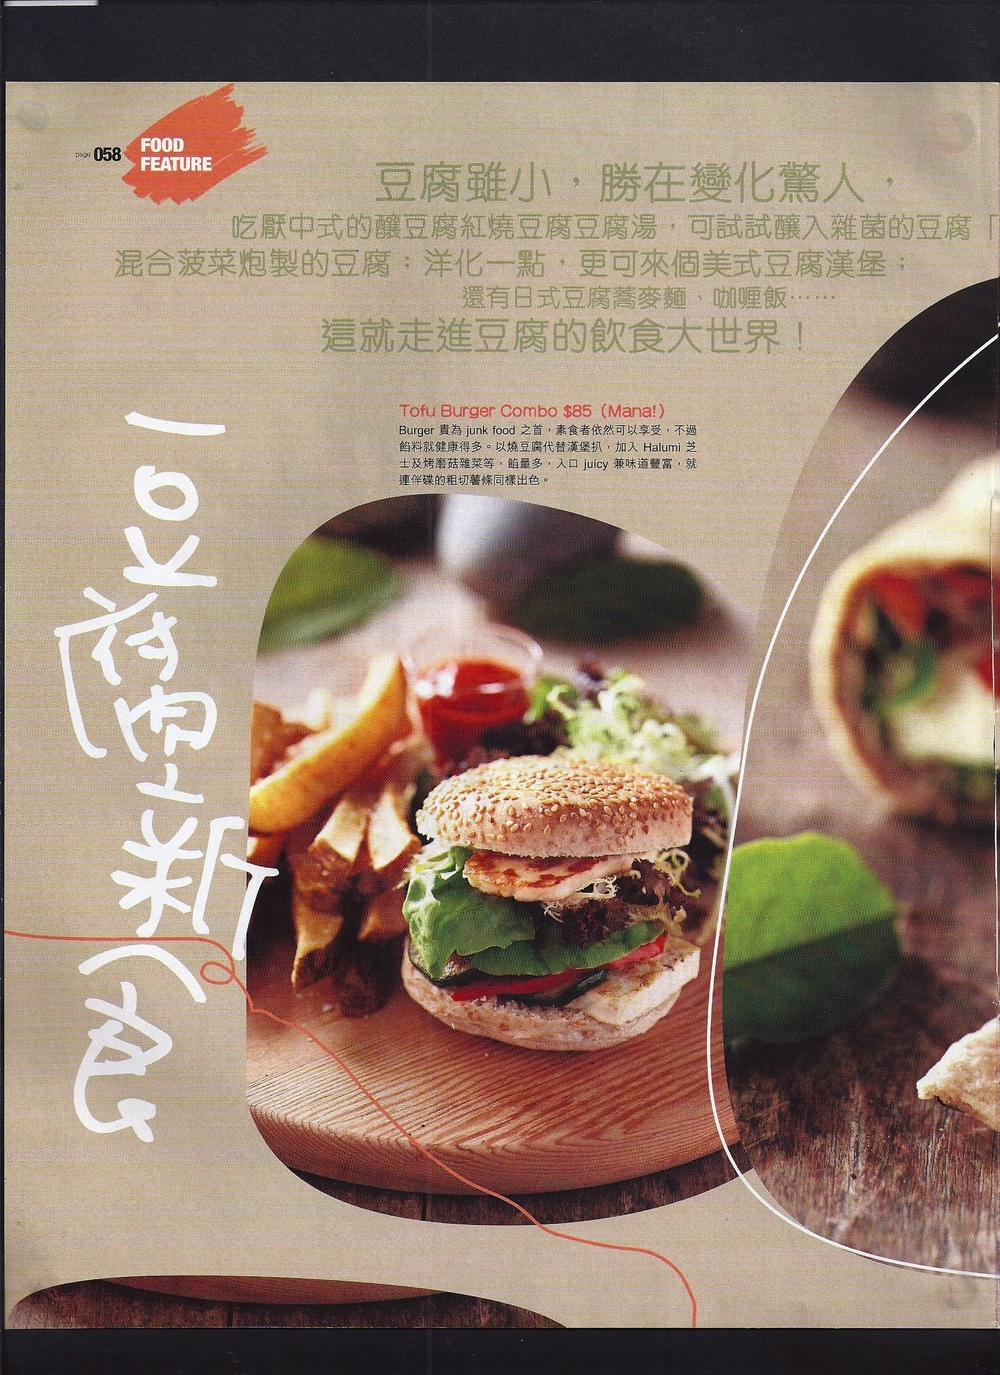 2012-10 Chinese Media 01.jpg